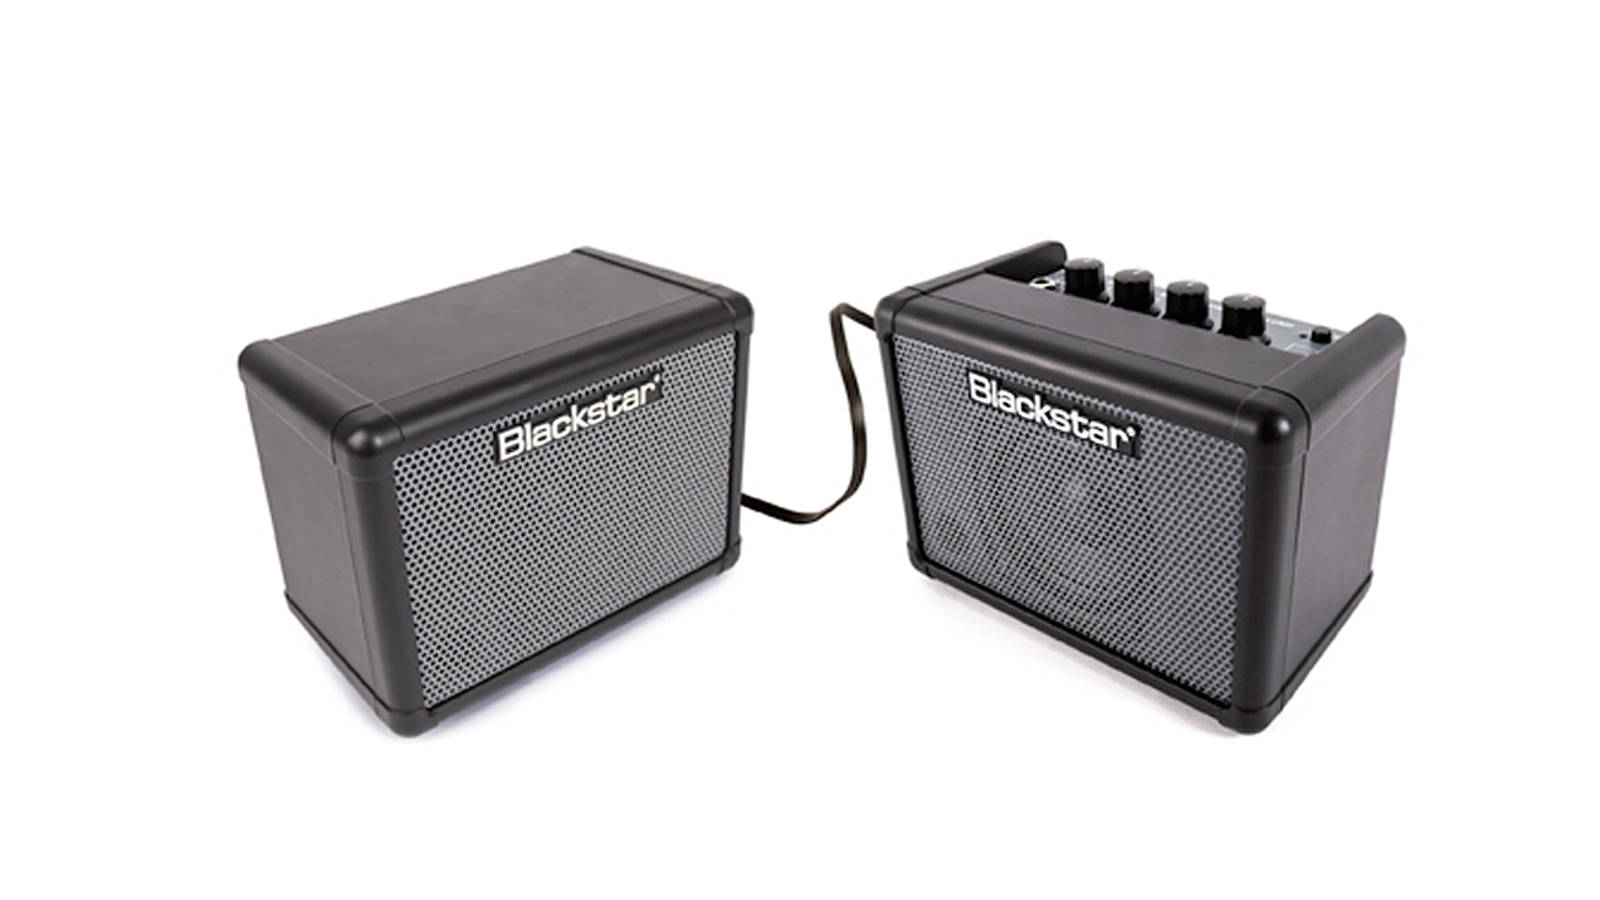 Blackstars FLY 3 Bass Pack